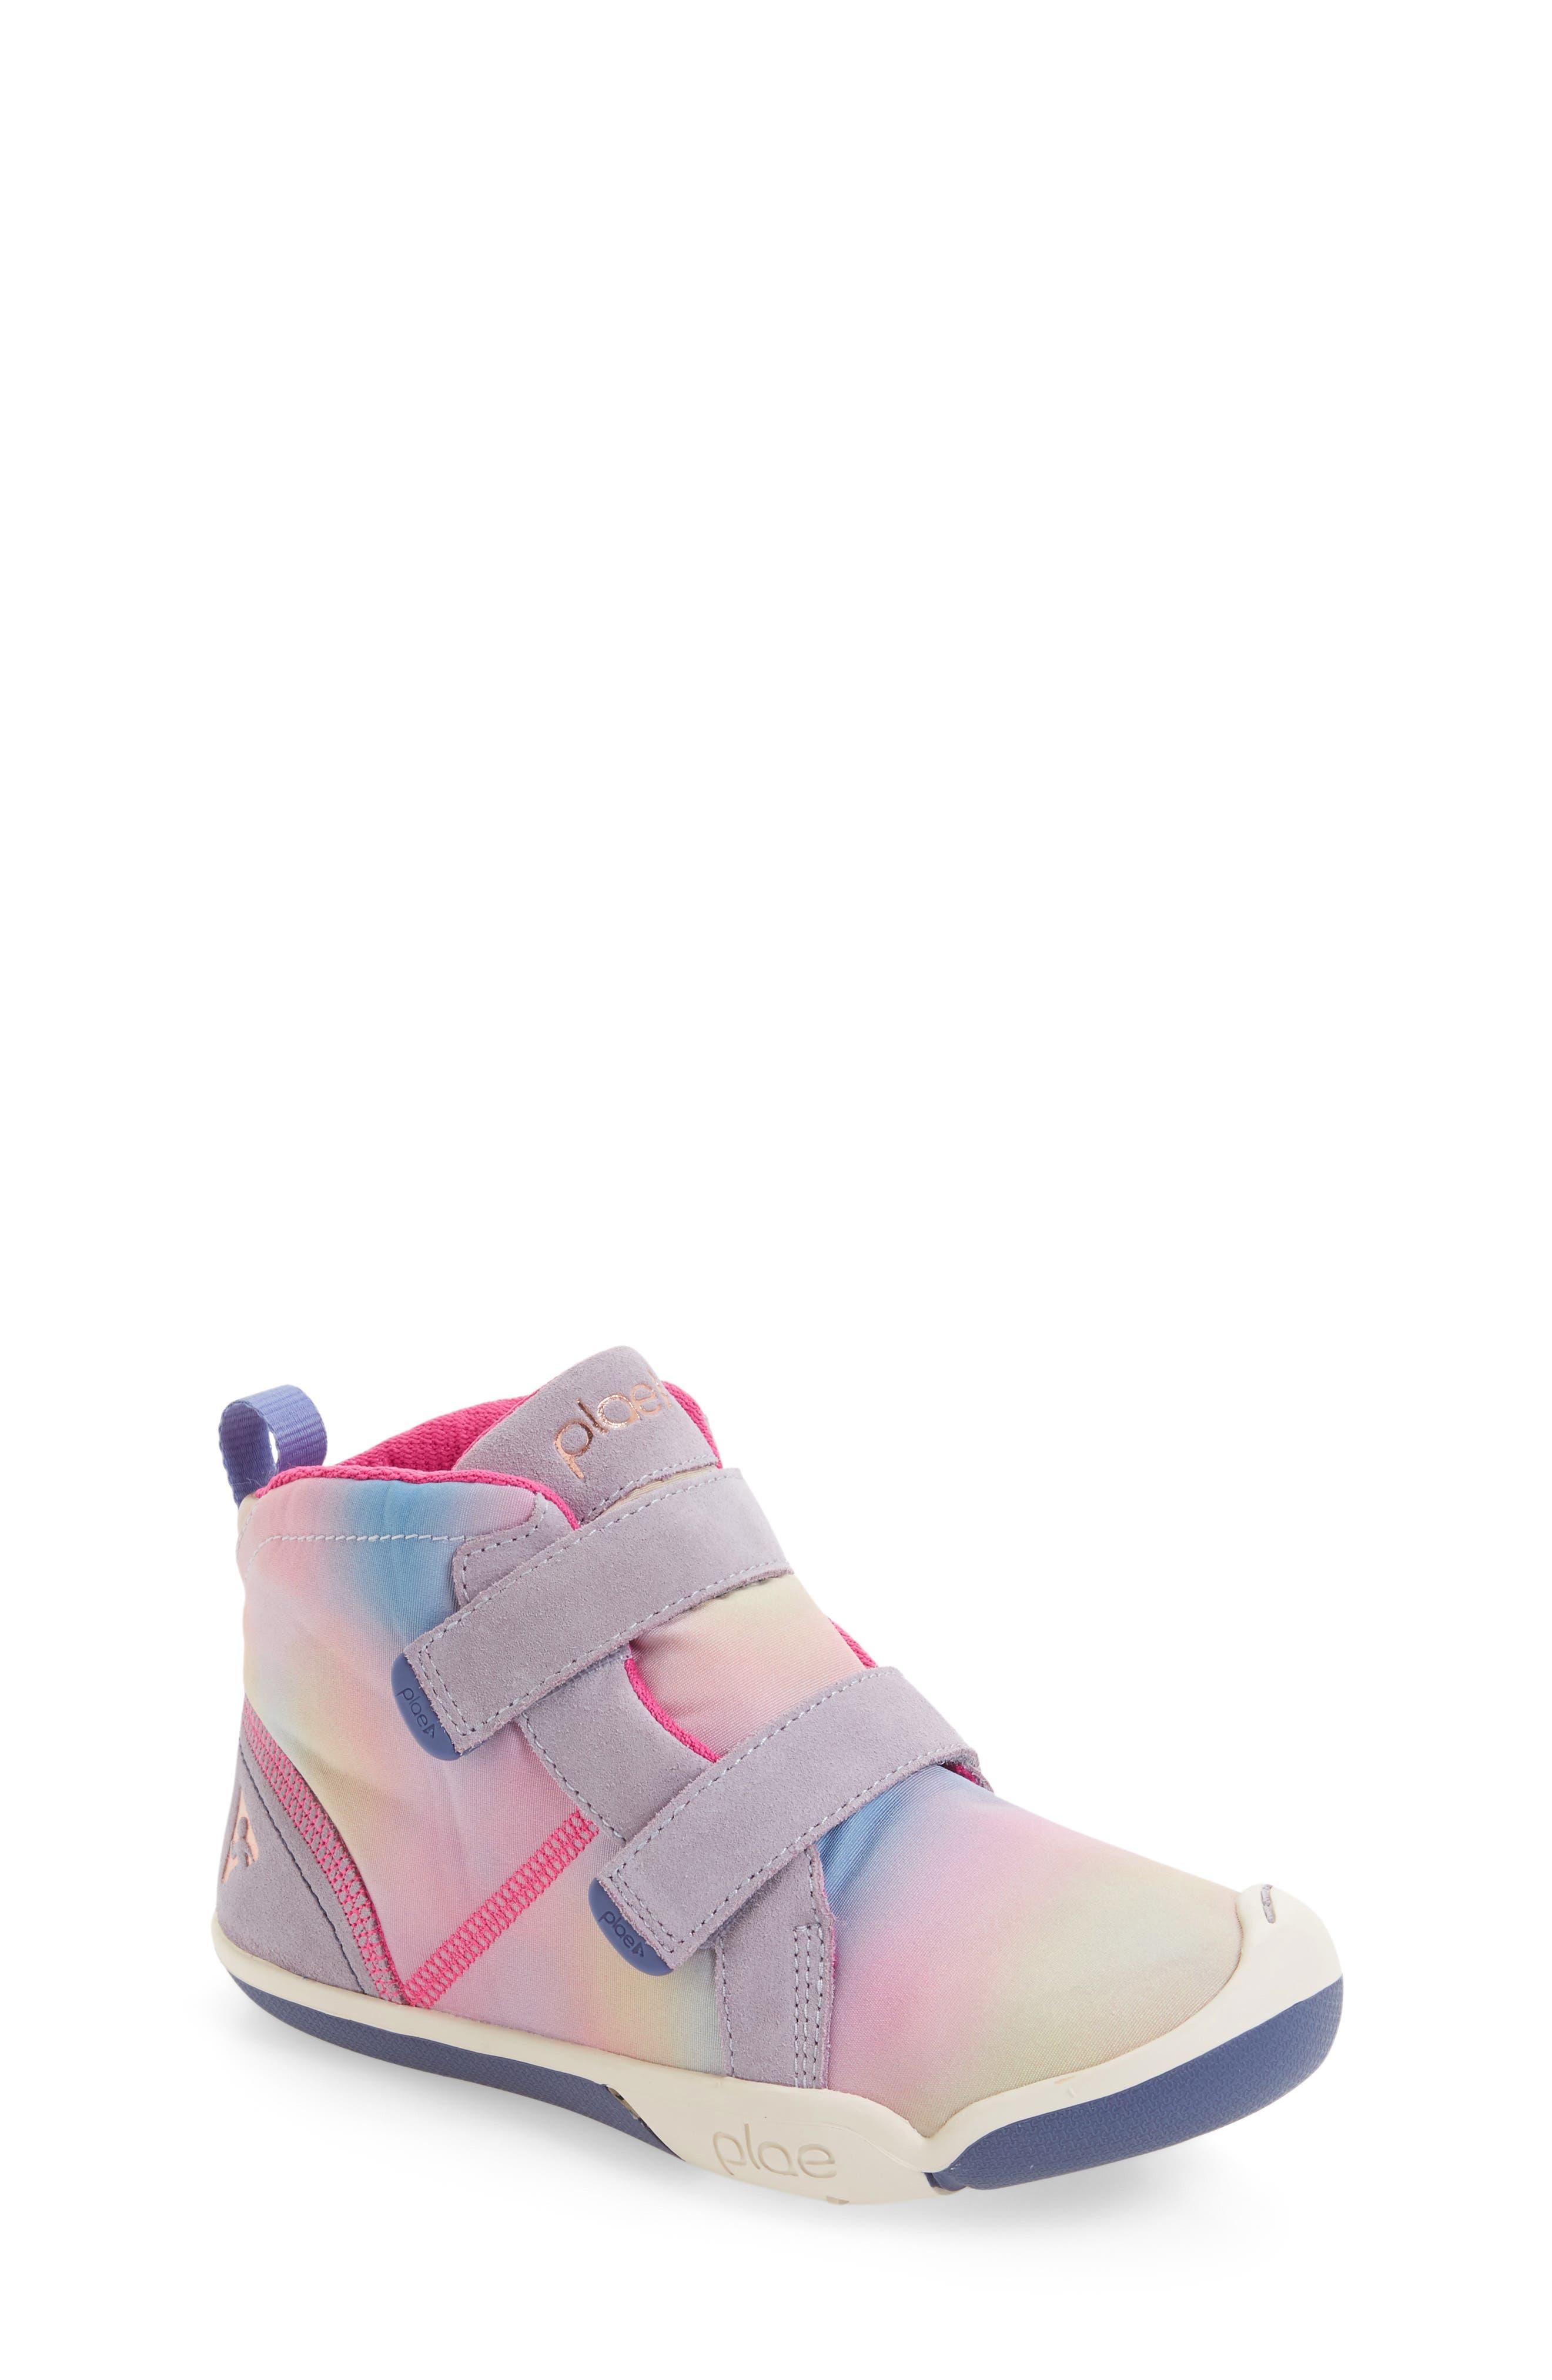 Max Customizable High Top Sneaker,                             Main thumbnail 1, color,                             FUN AURORA SUEDE